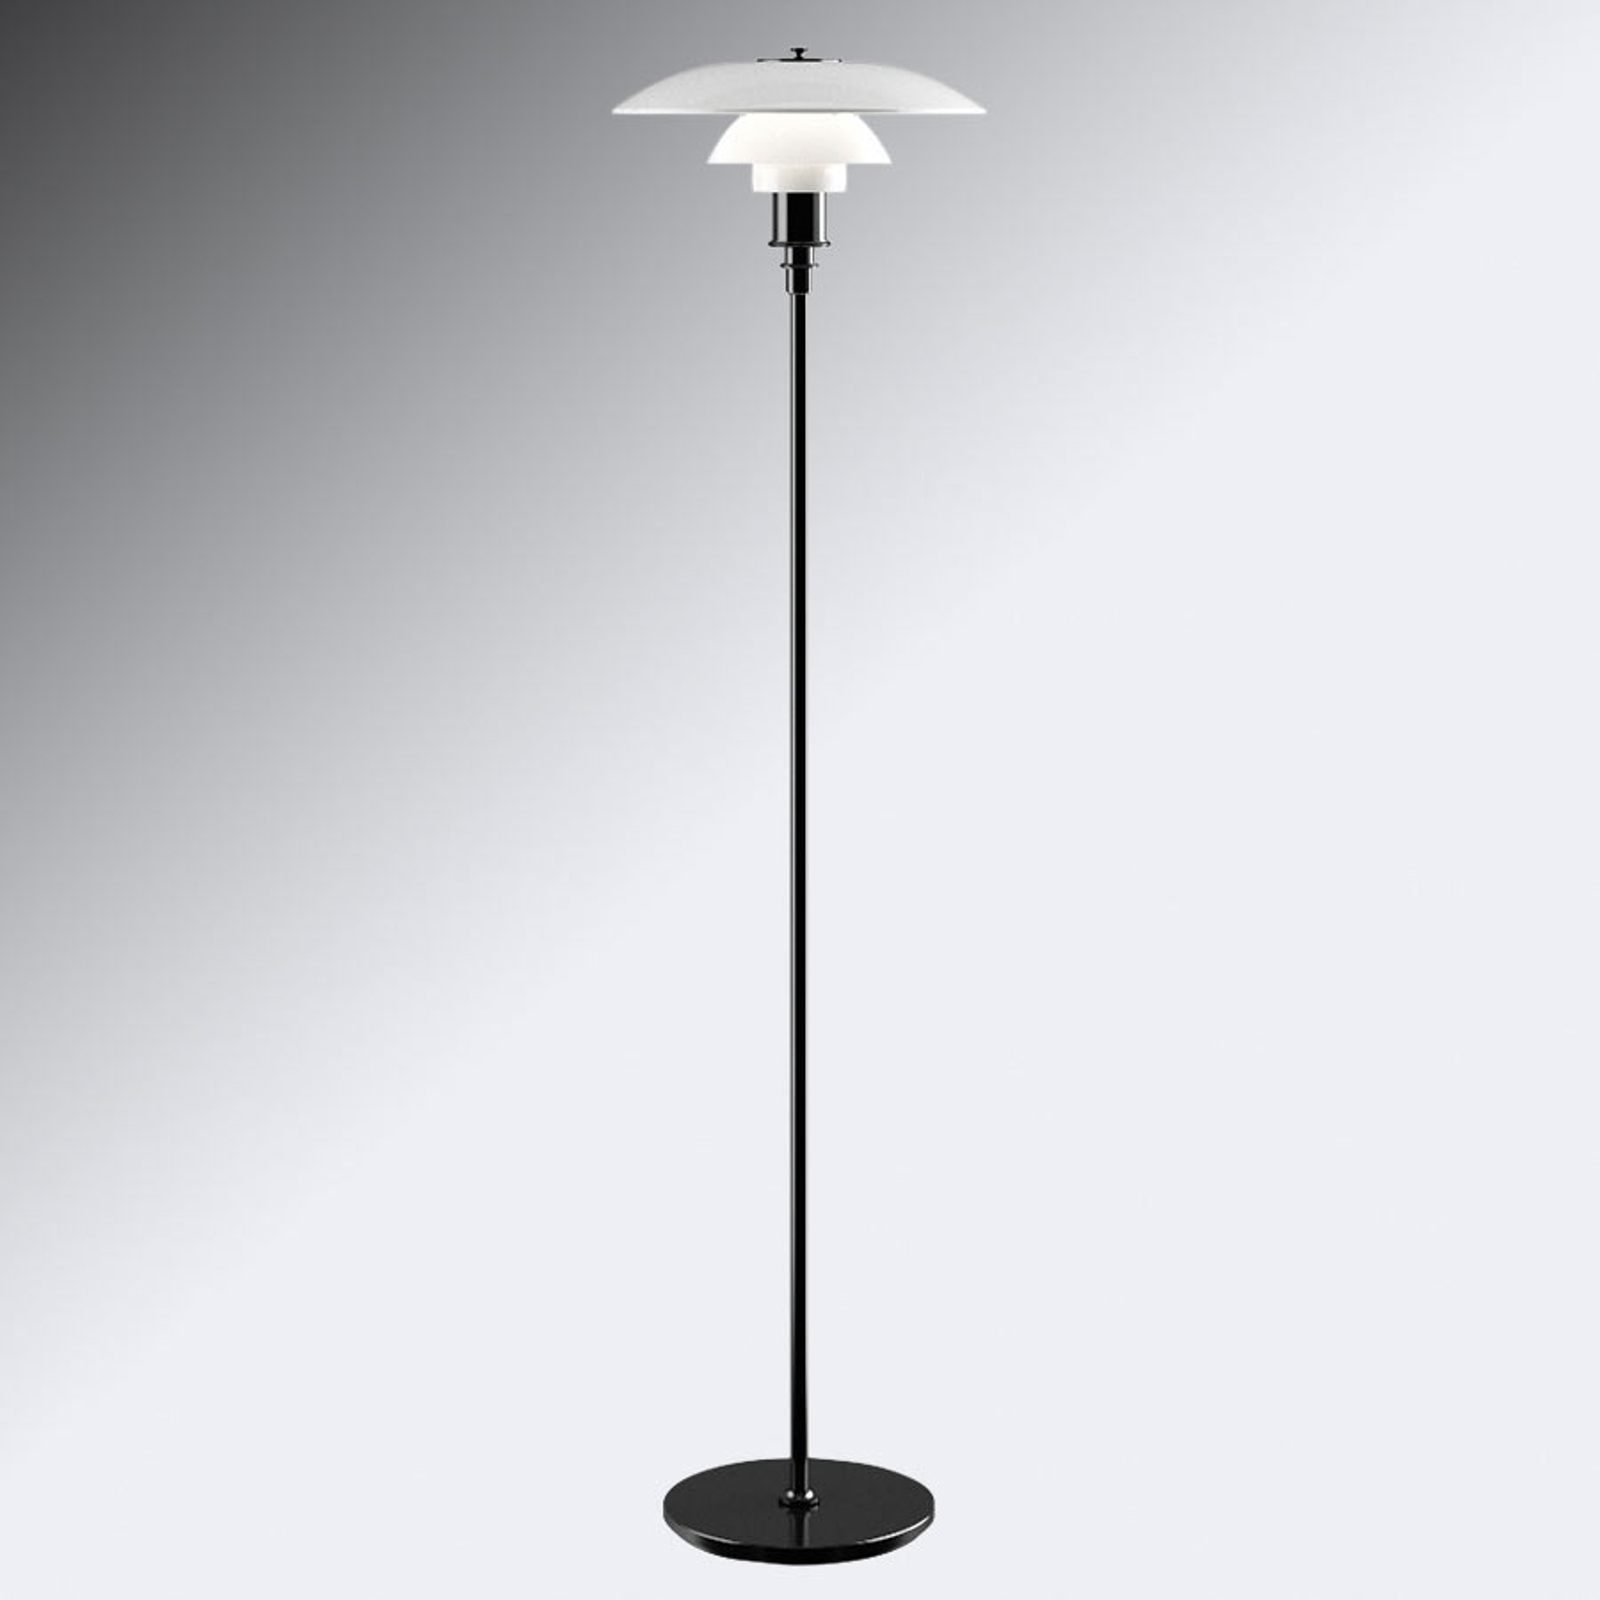 Louis Poulsen PH 3 1/2-2 1/2 Stehlampe schwarz